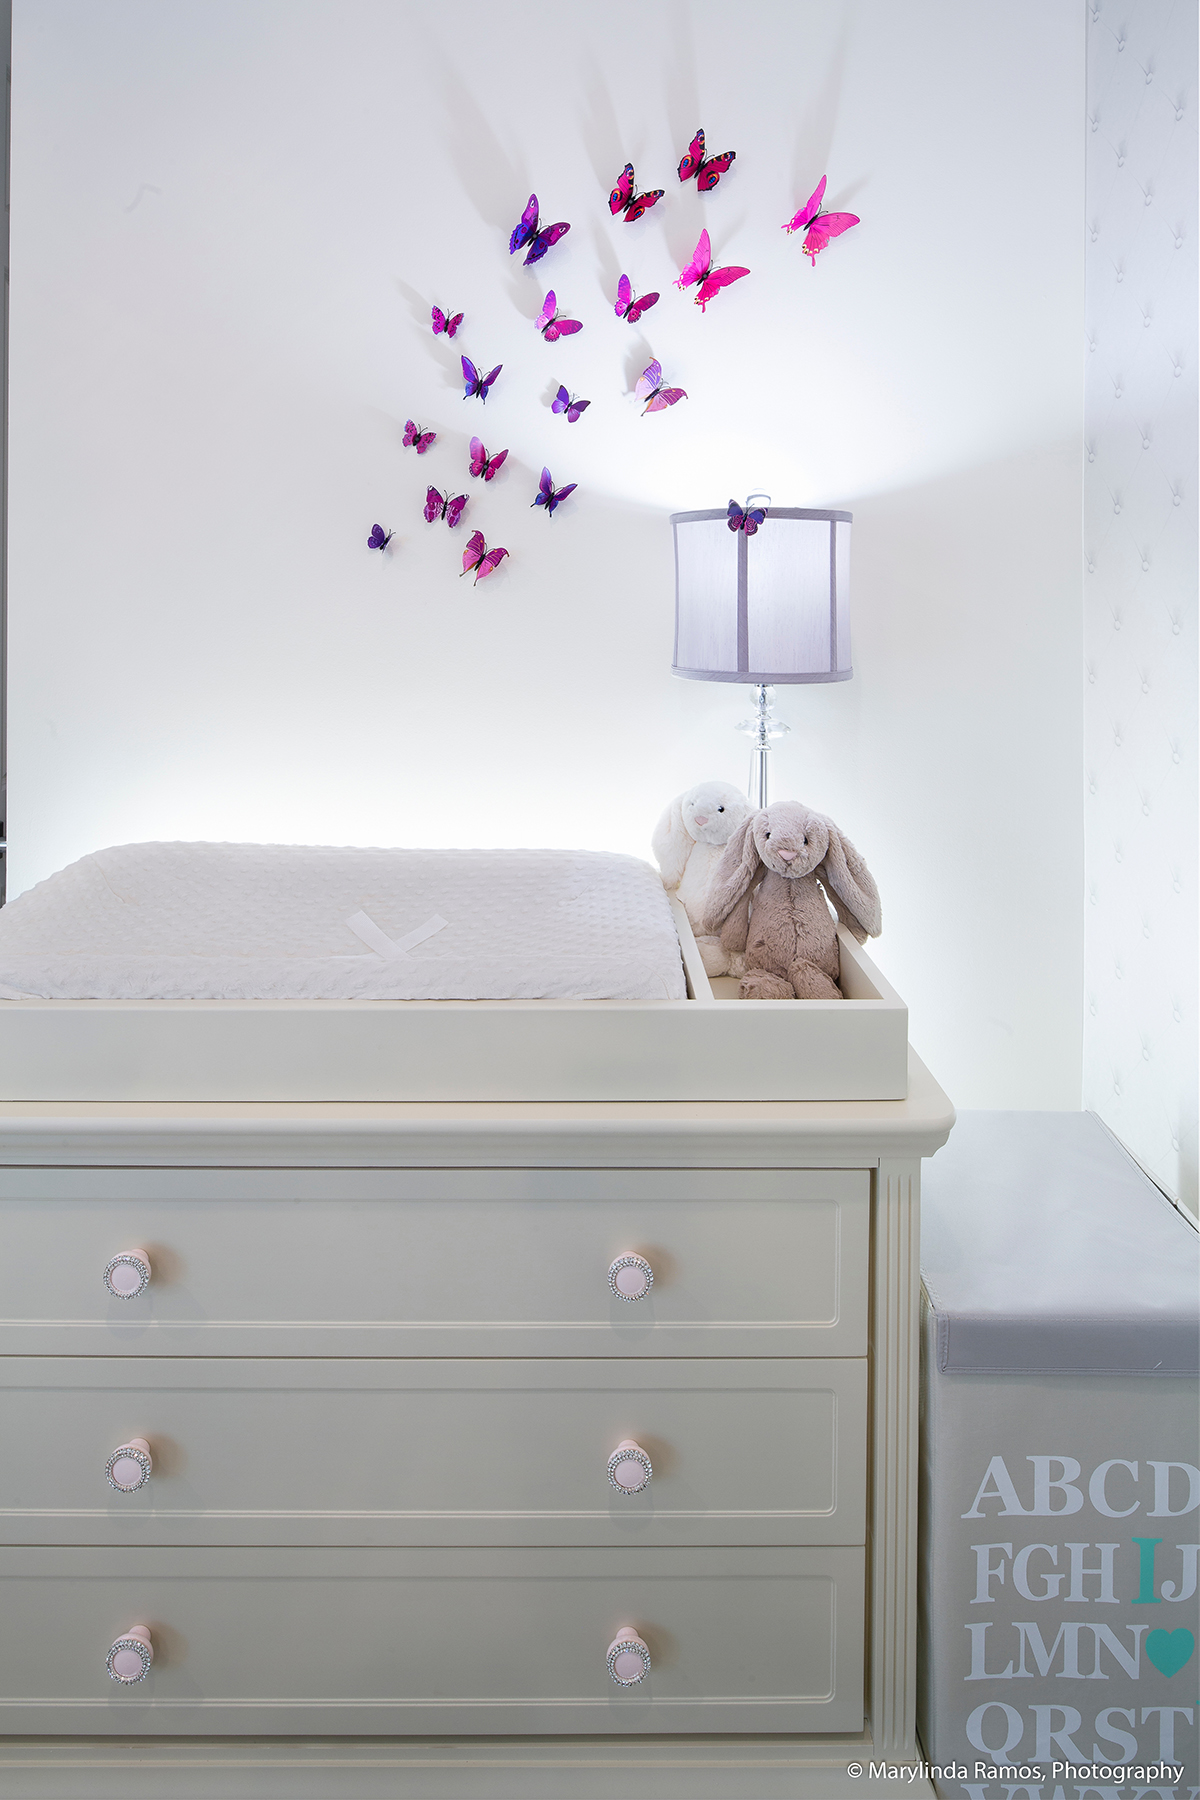 Classic Baby Nursery, Rooms by Eve, Eve Joss, Interior Design in Boca Raton, FL12.jpg